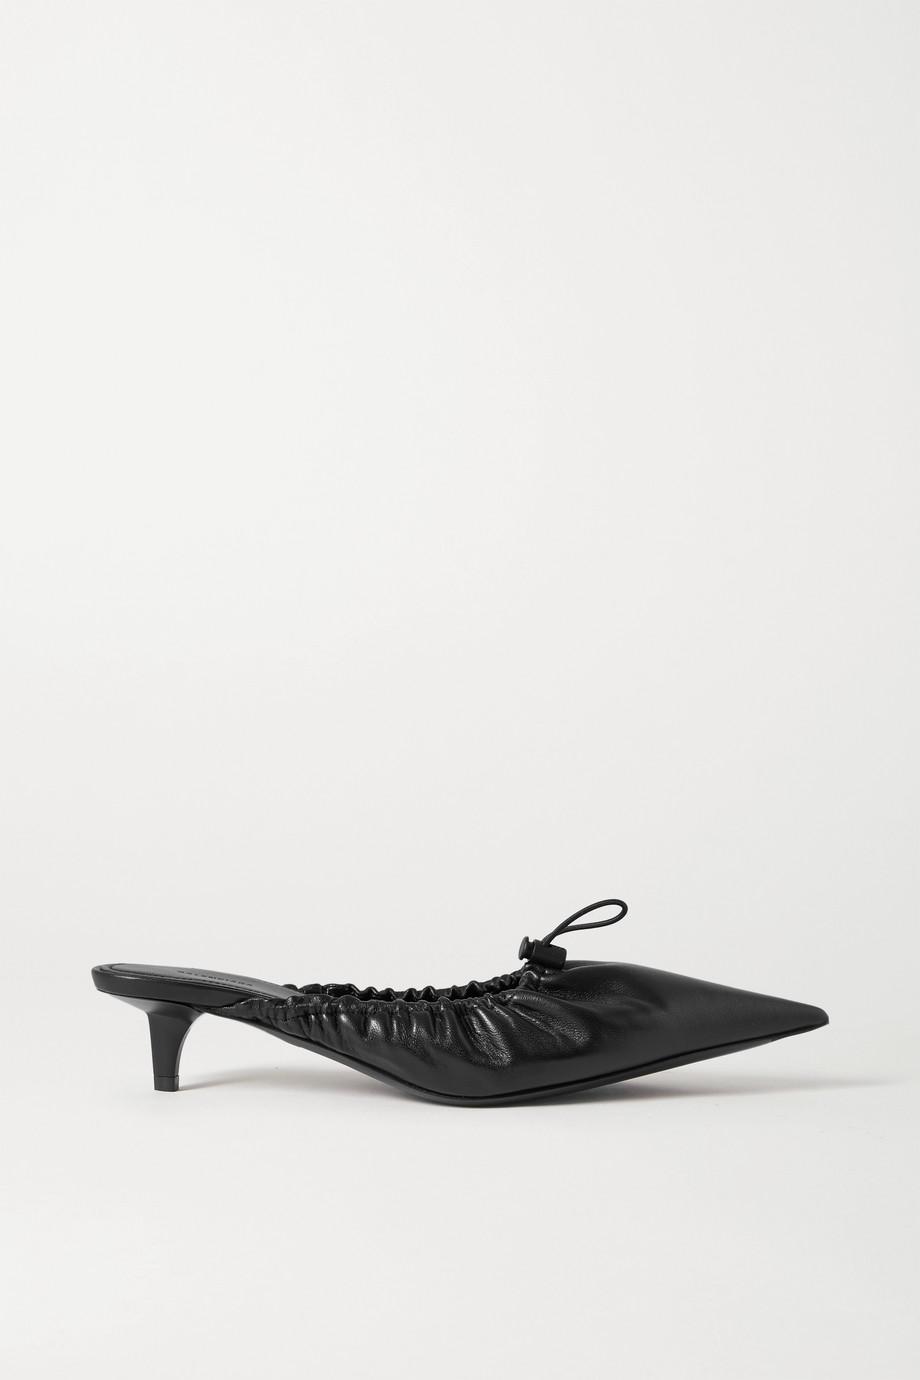 Balenciaga Scrunch Knife Mules aus Leder mit Raffungen